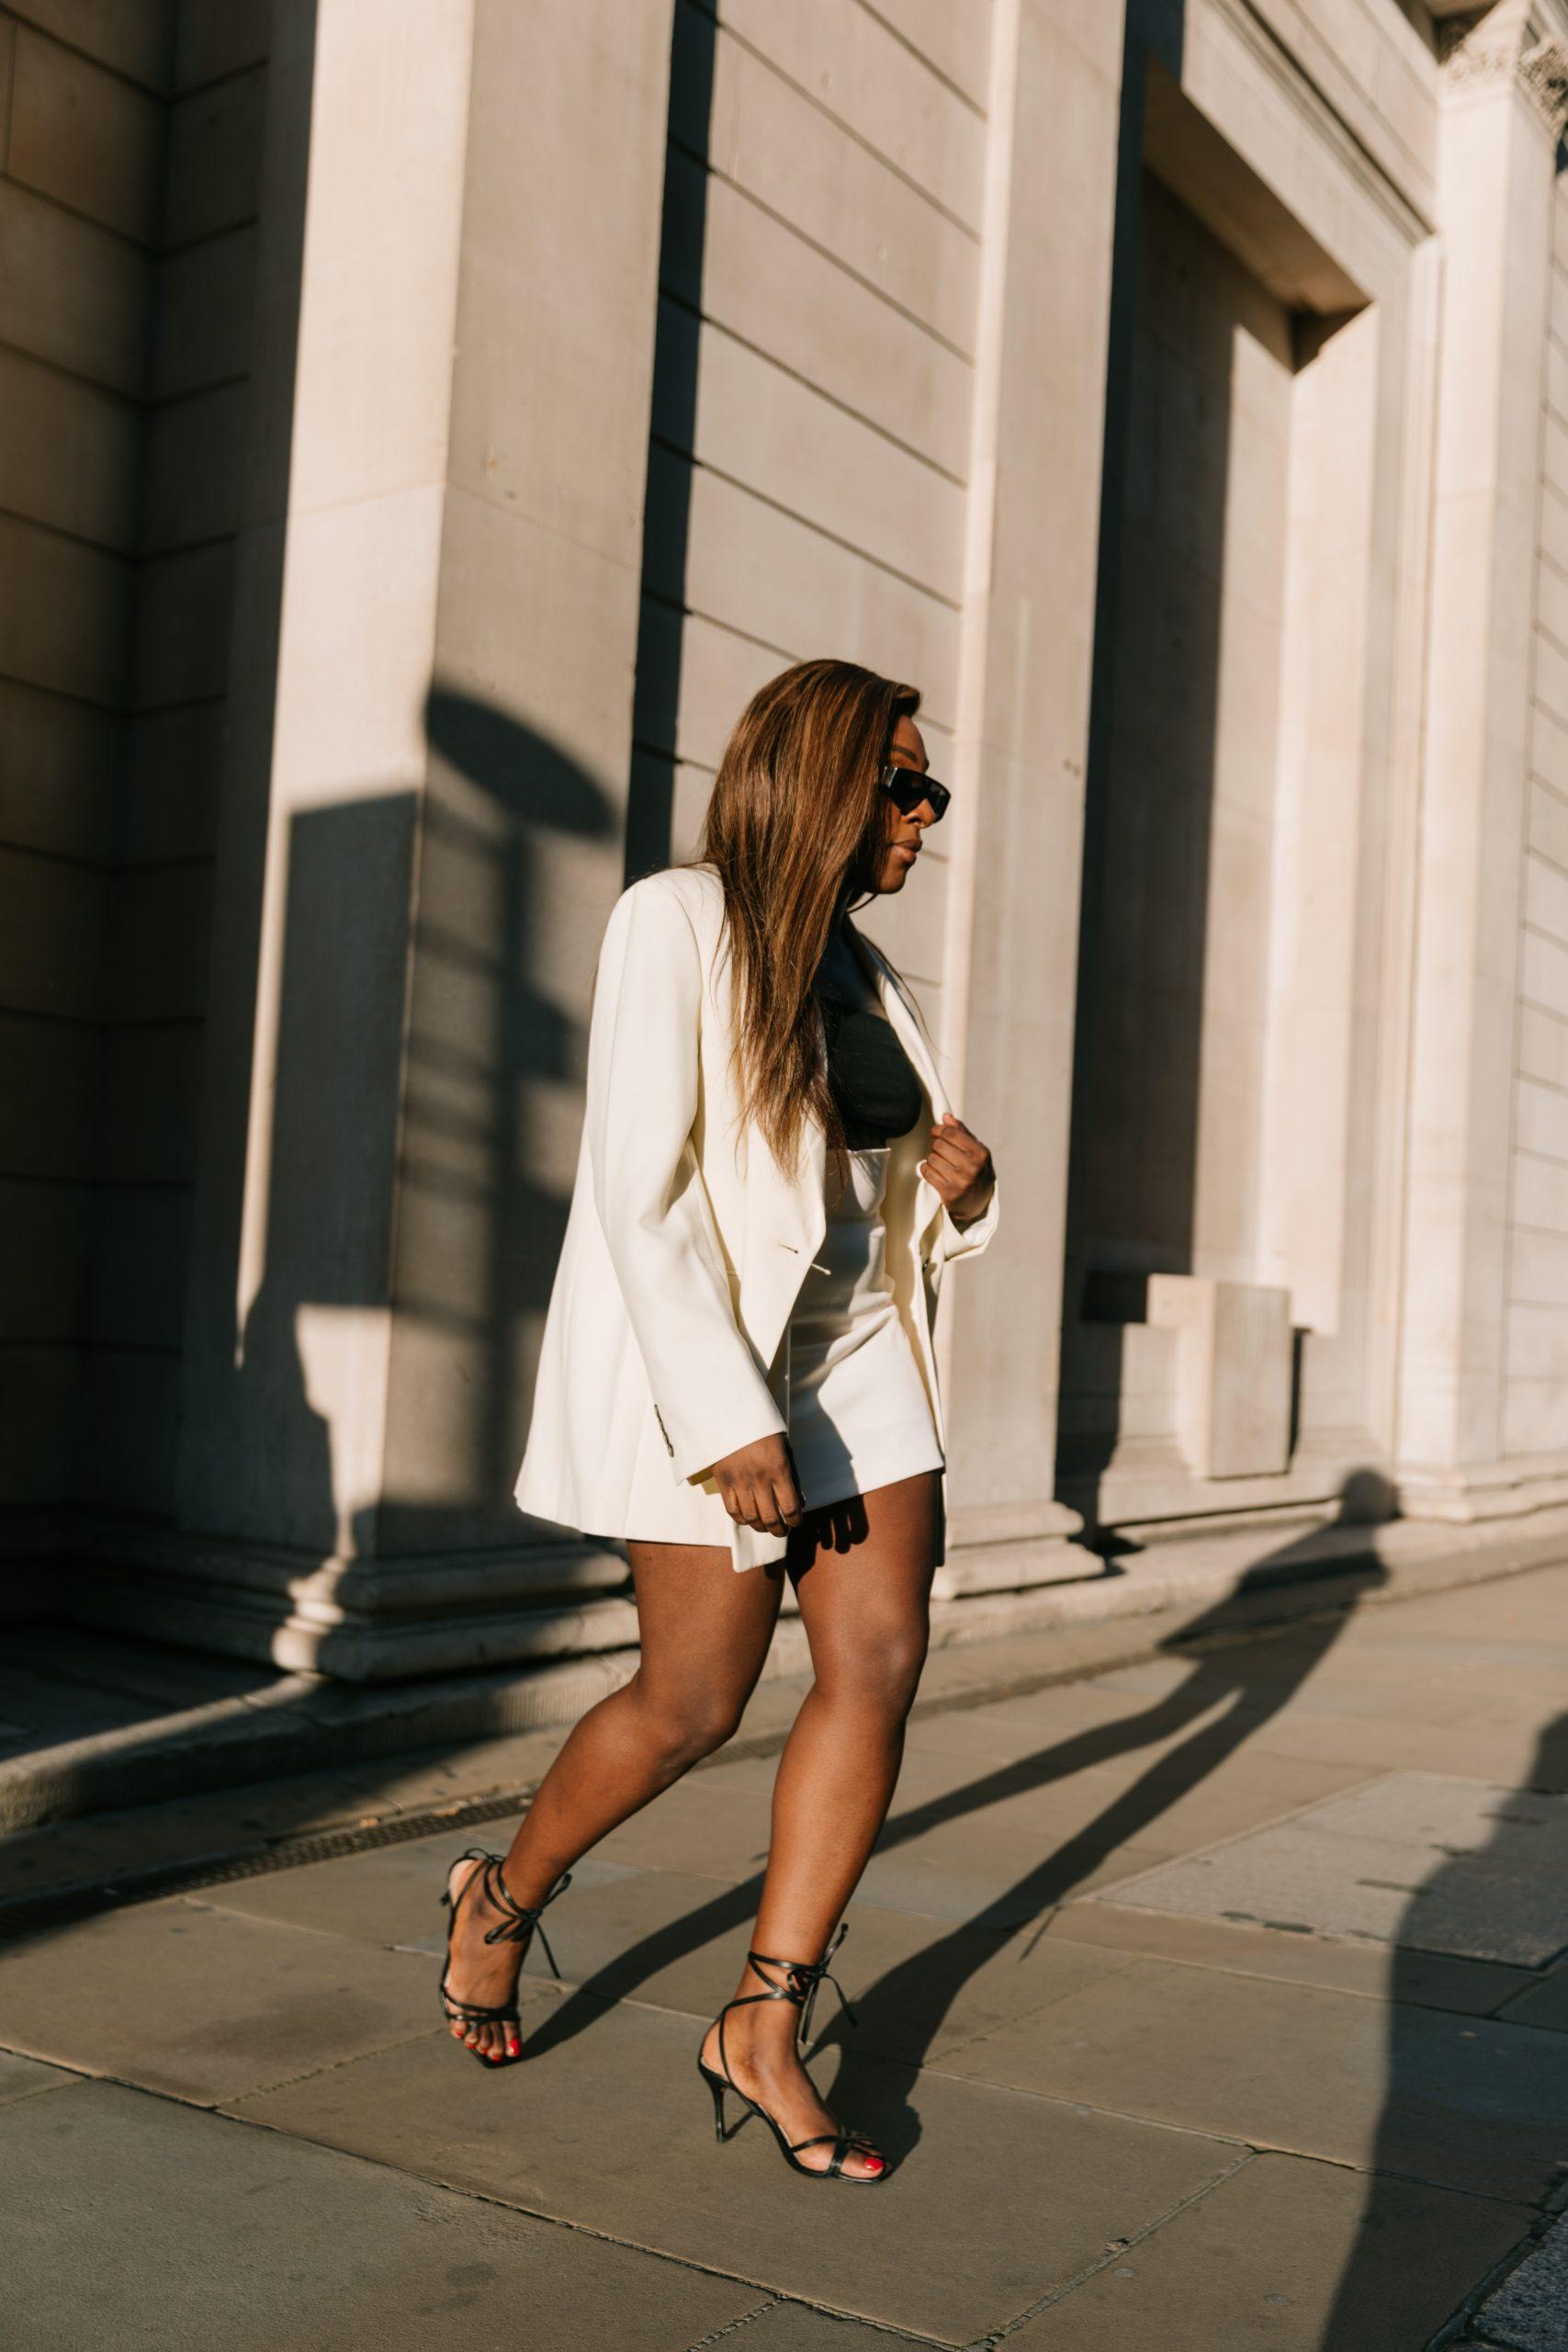 Oversized Blazers & Autumn Mini Skirts - Zara ecru blazer and strappy heels  - Bottega Veneta Sunglasses - Tasha Antwi